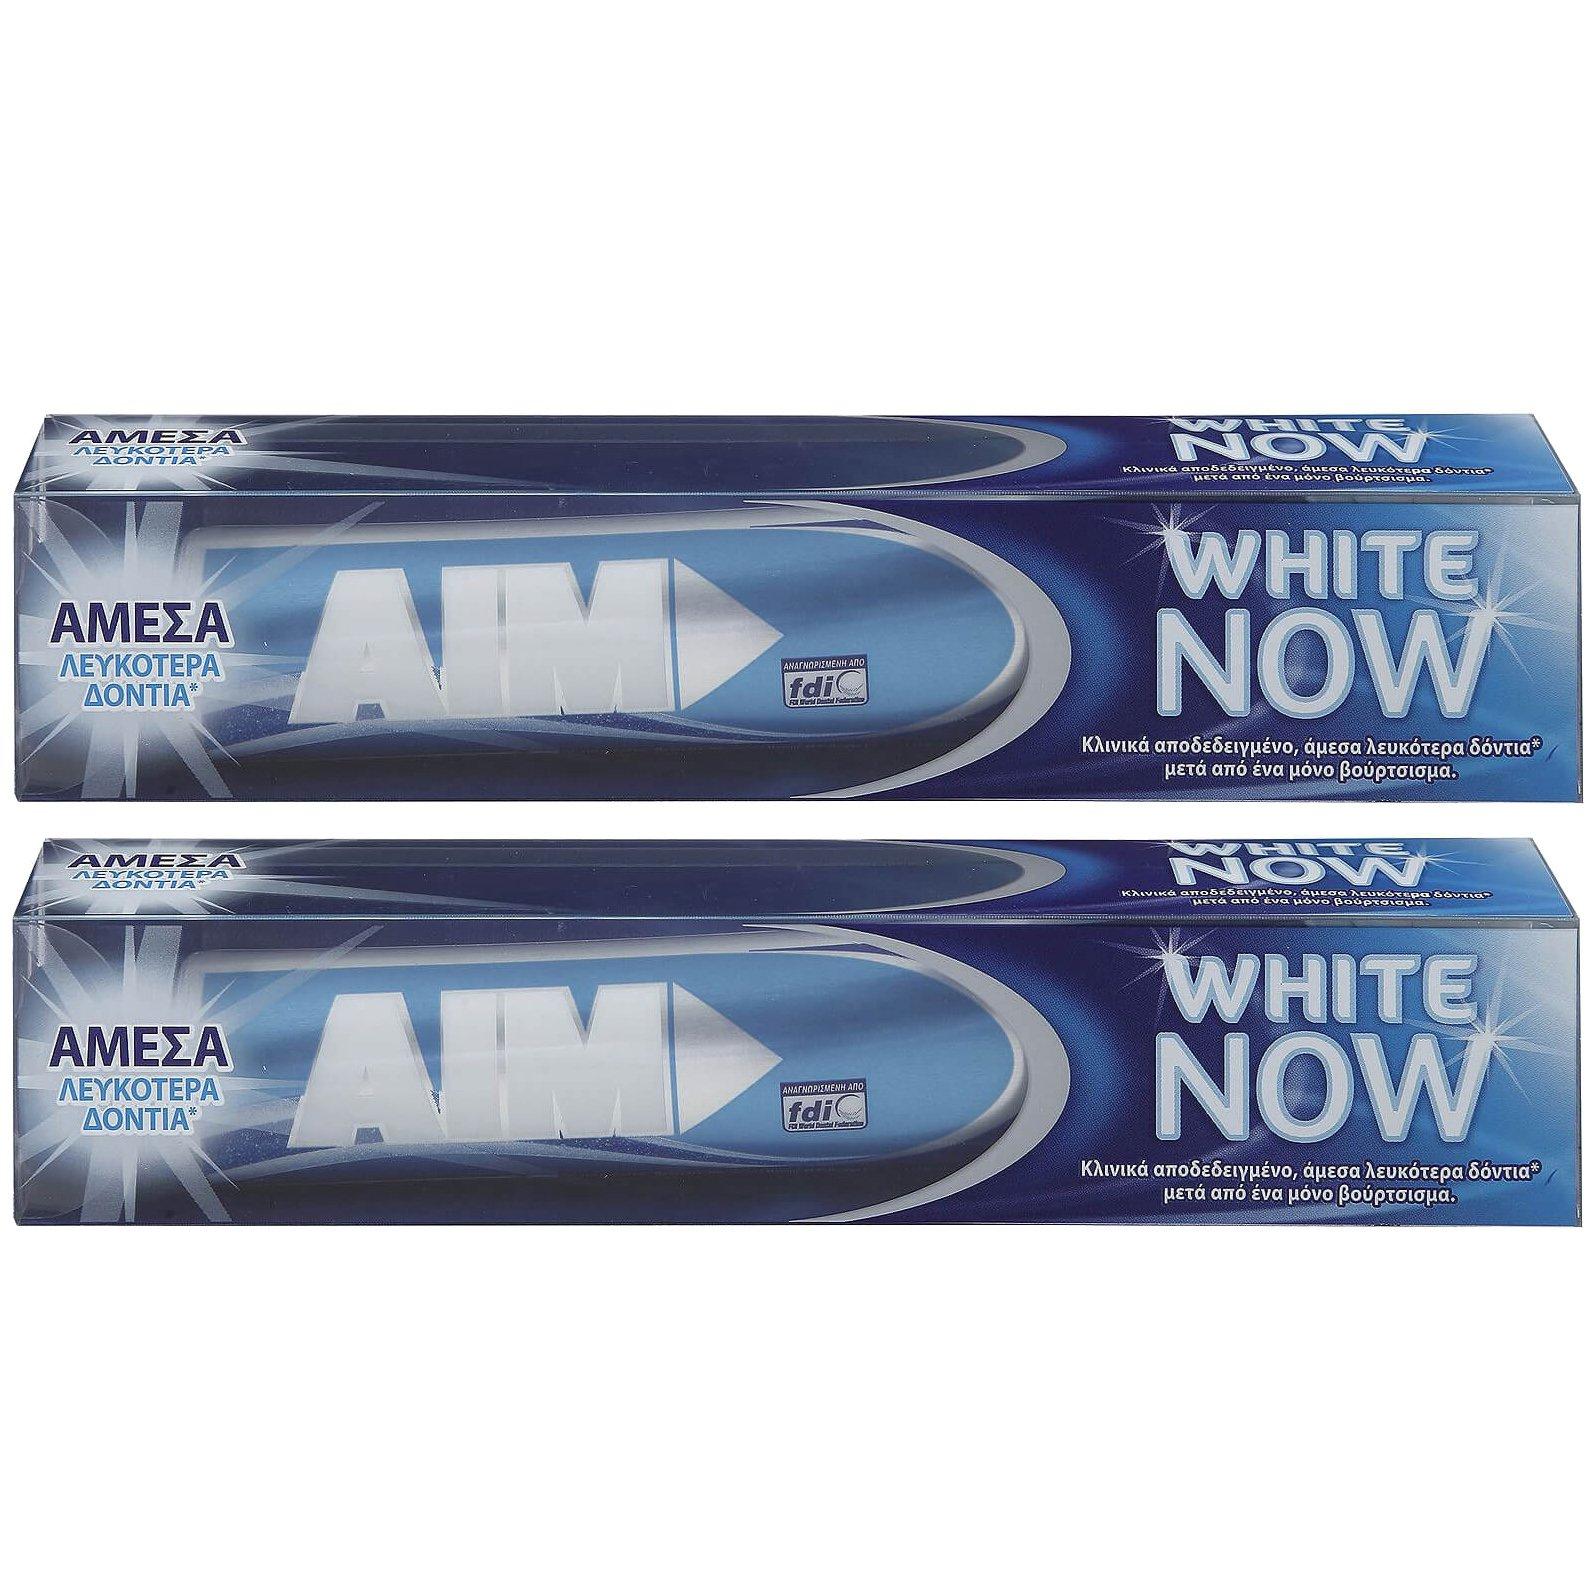 AIM Πακέτο Προσφοράς White Now Οδοντόκρεμα για Άμεσα Λευκότερα Δόντια 2x75ml 1+1 Δώρο